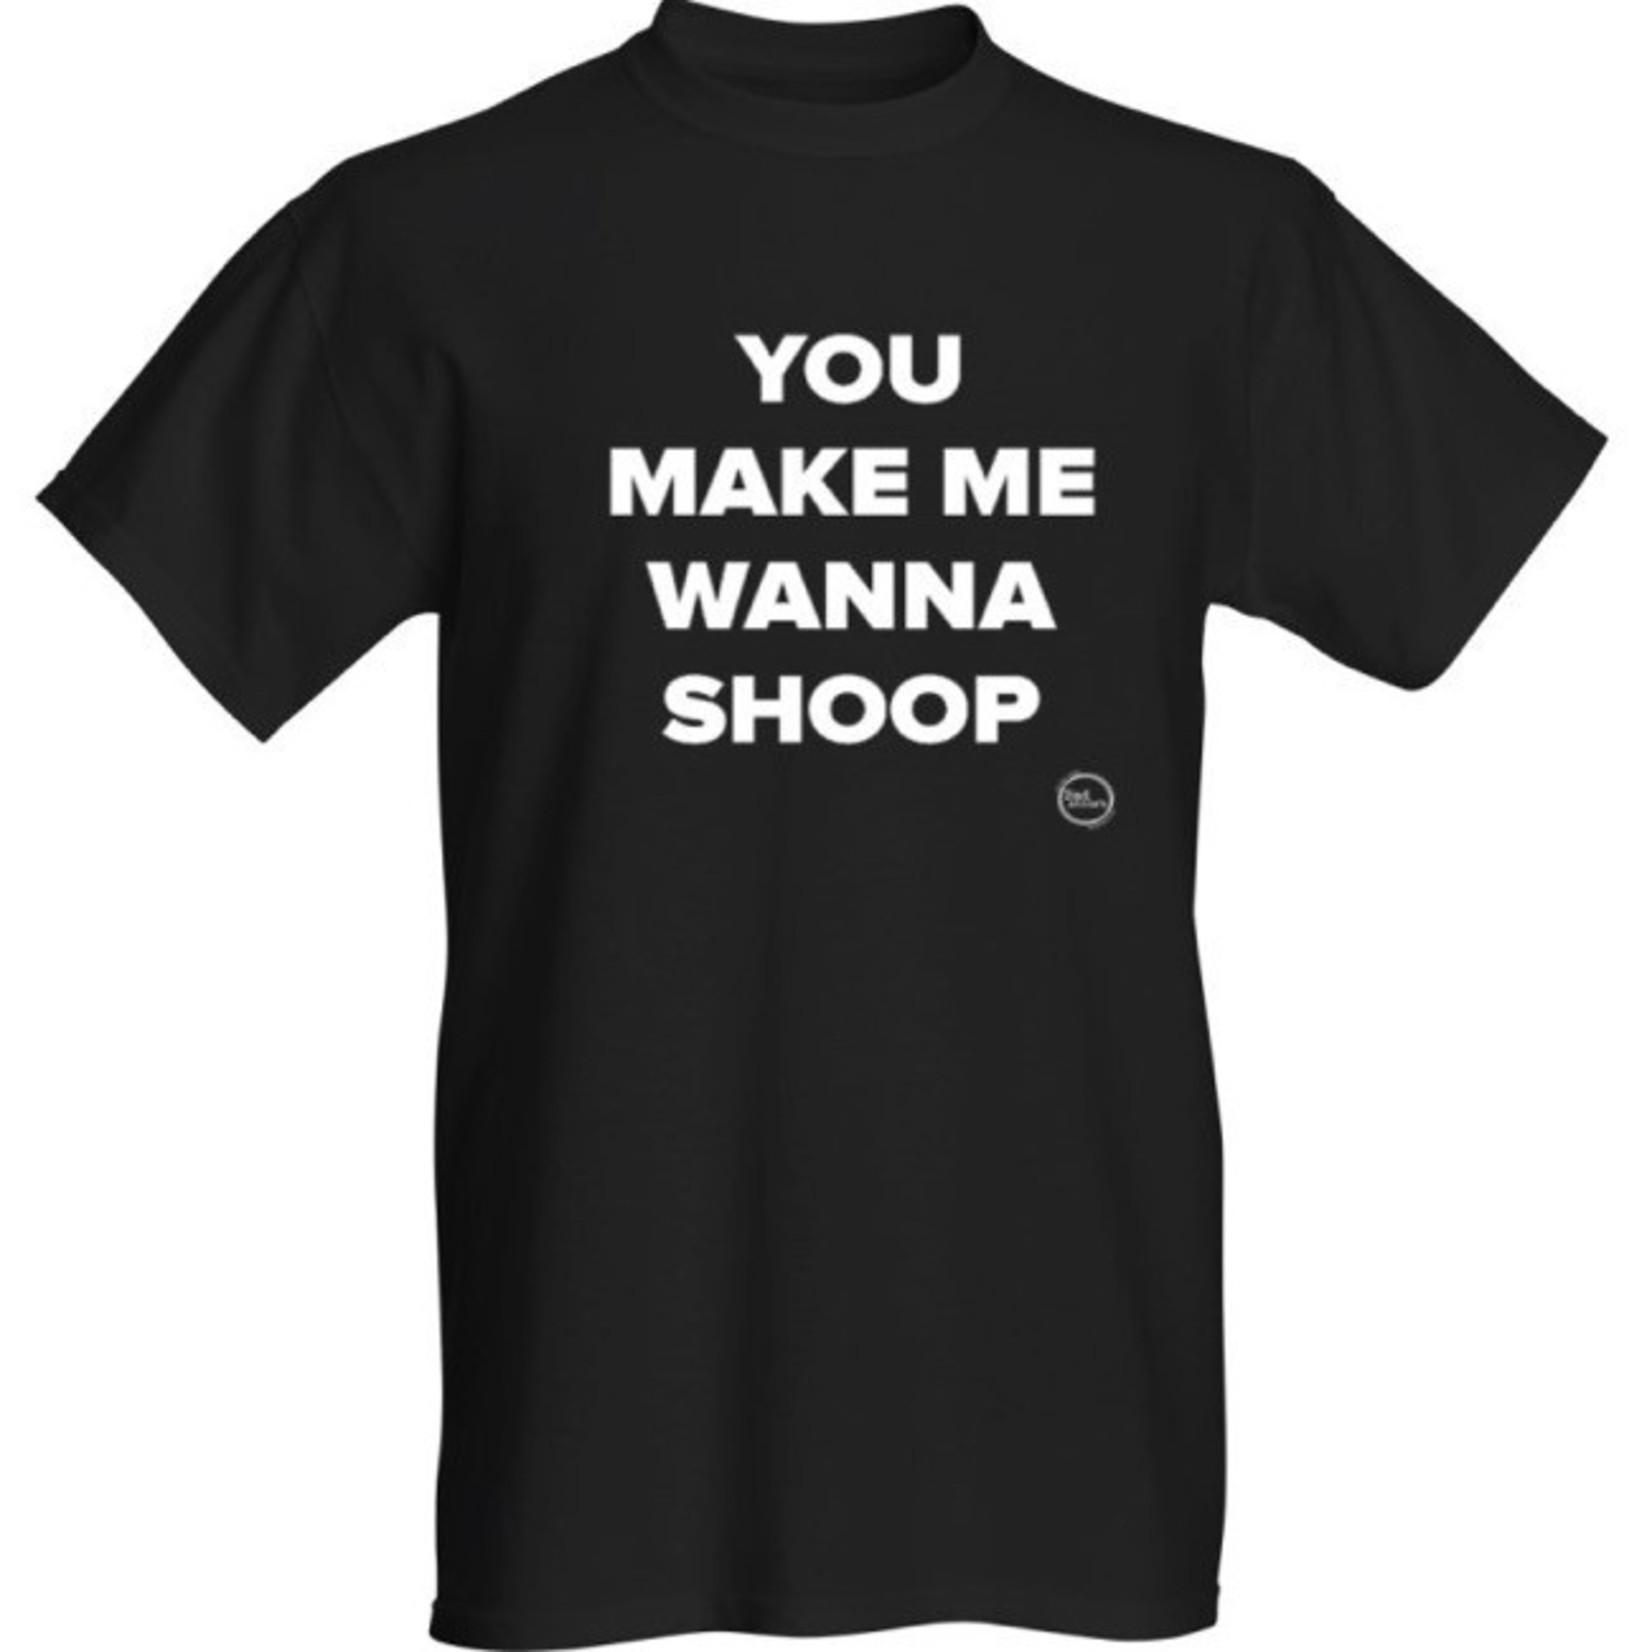 Bad Annie's T-Shirt - You Make Me Wanna Shoop